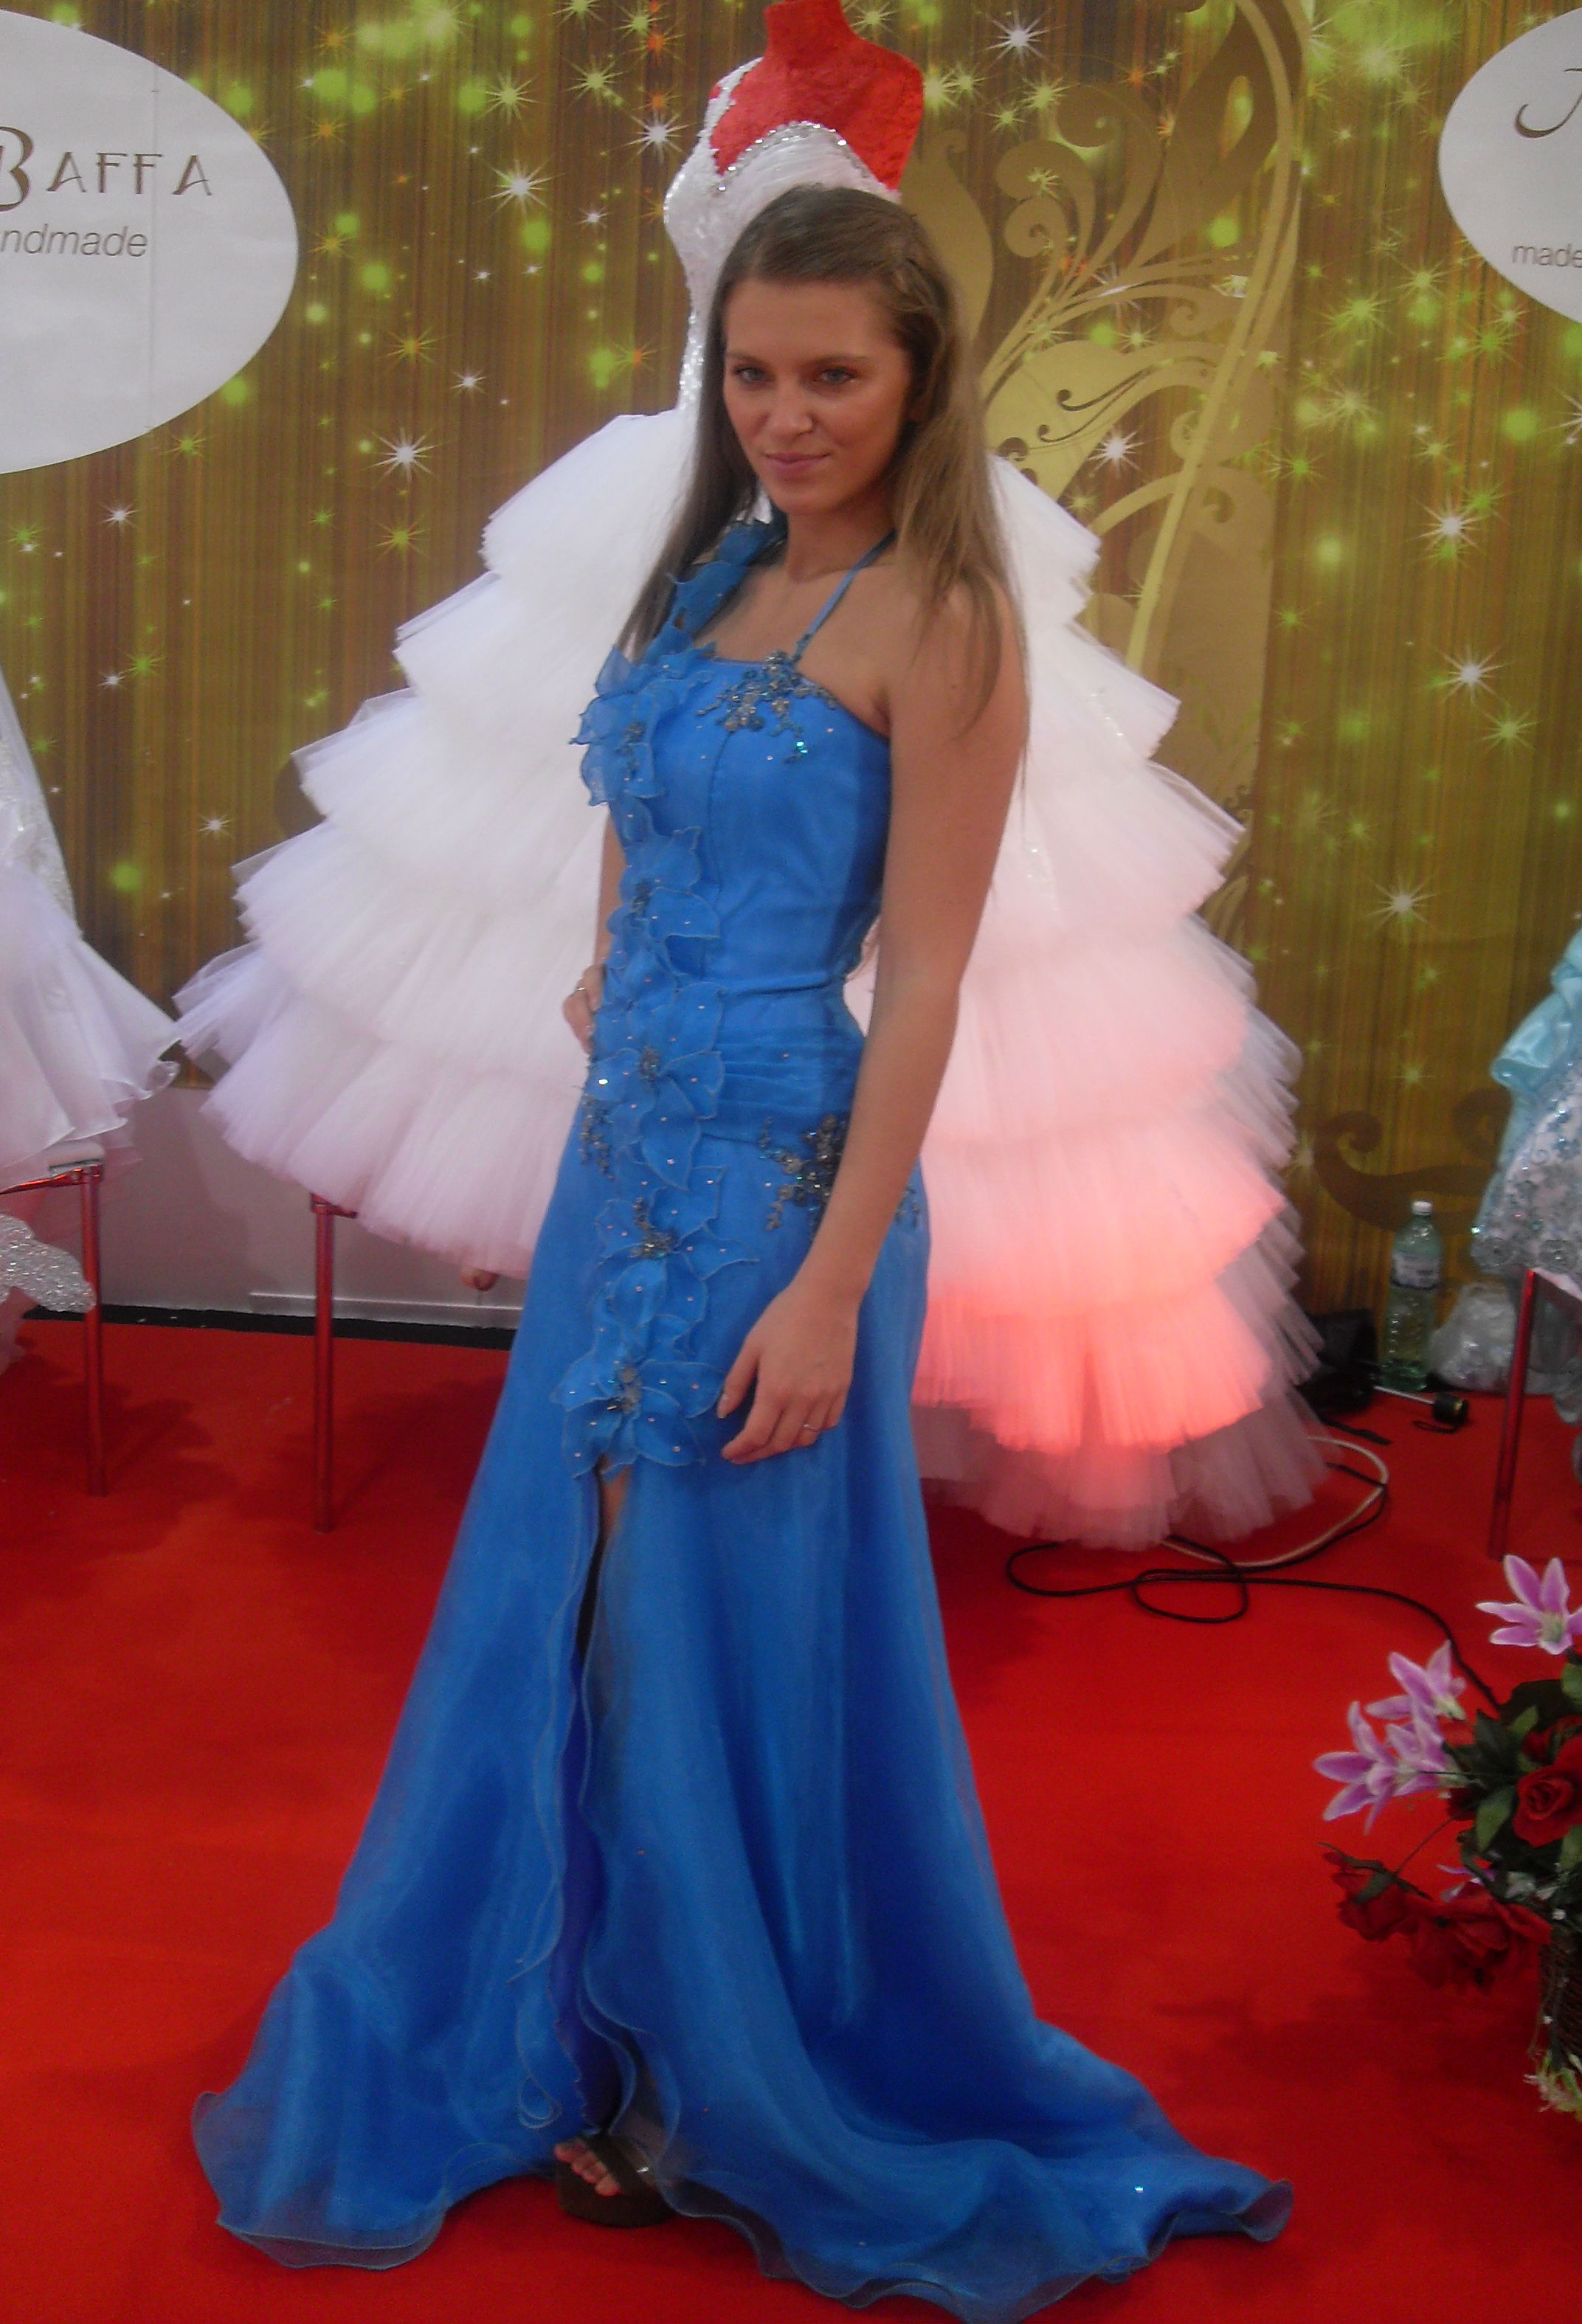 Violetta Solonko Violettas Melina Baffa